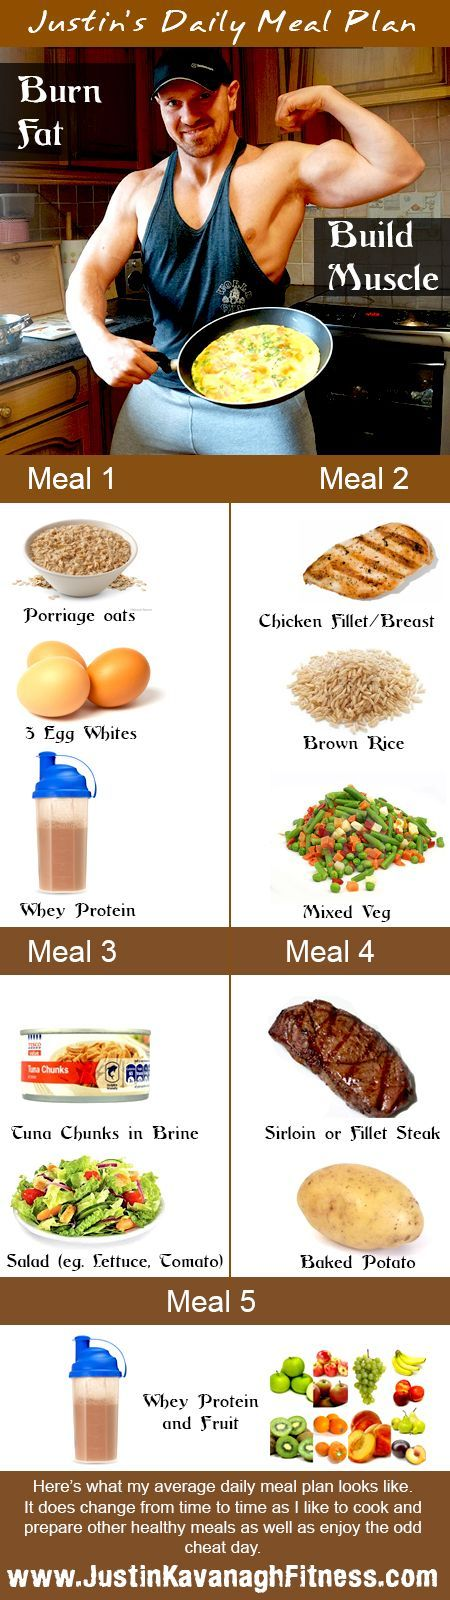 Pediatric weight loss programs nj image 2